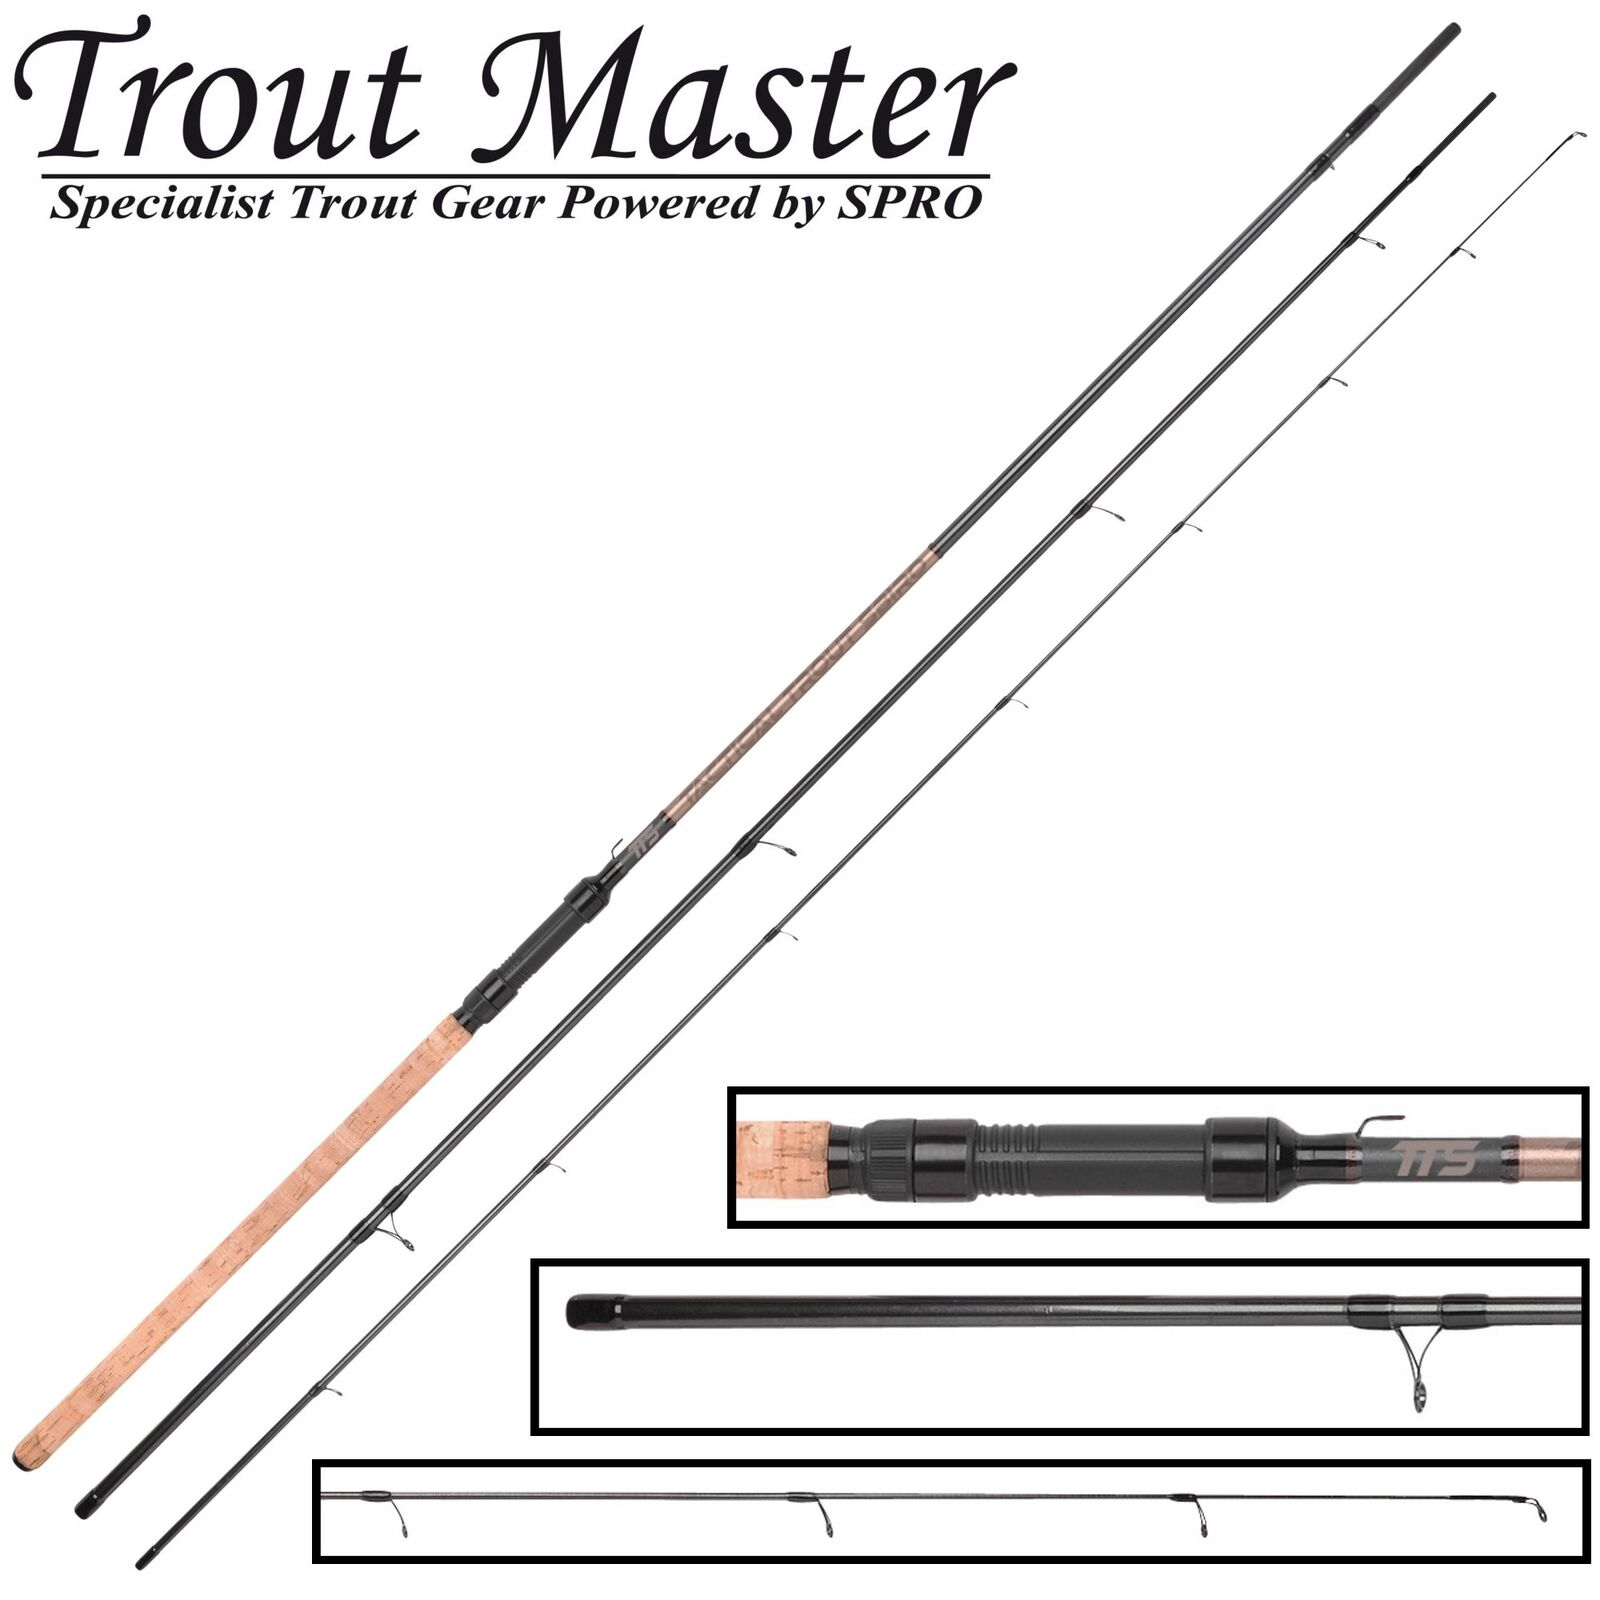 Trout Master Tactical Sbiro 3,30m 3-25g - Sbirolinorute, Angelrute, Forellenrute Forellenrute Forellenrute 26240b